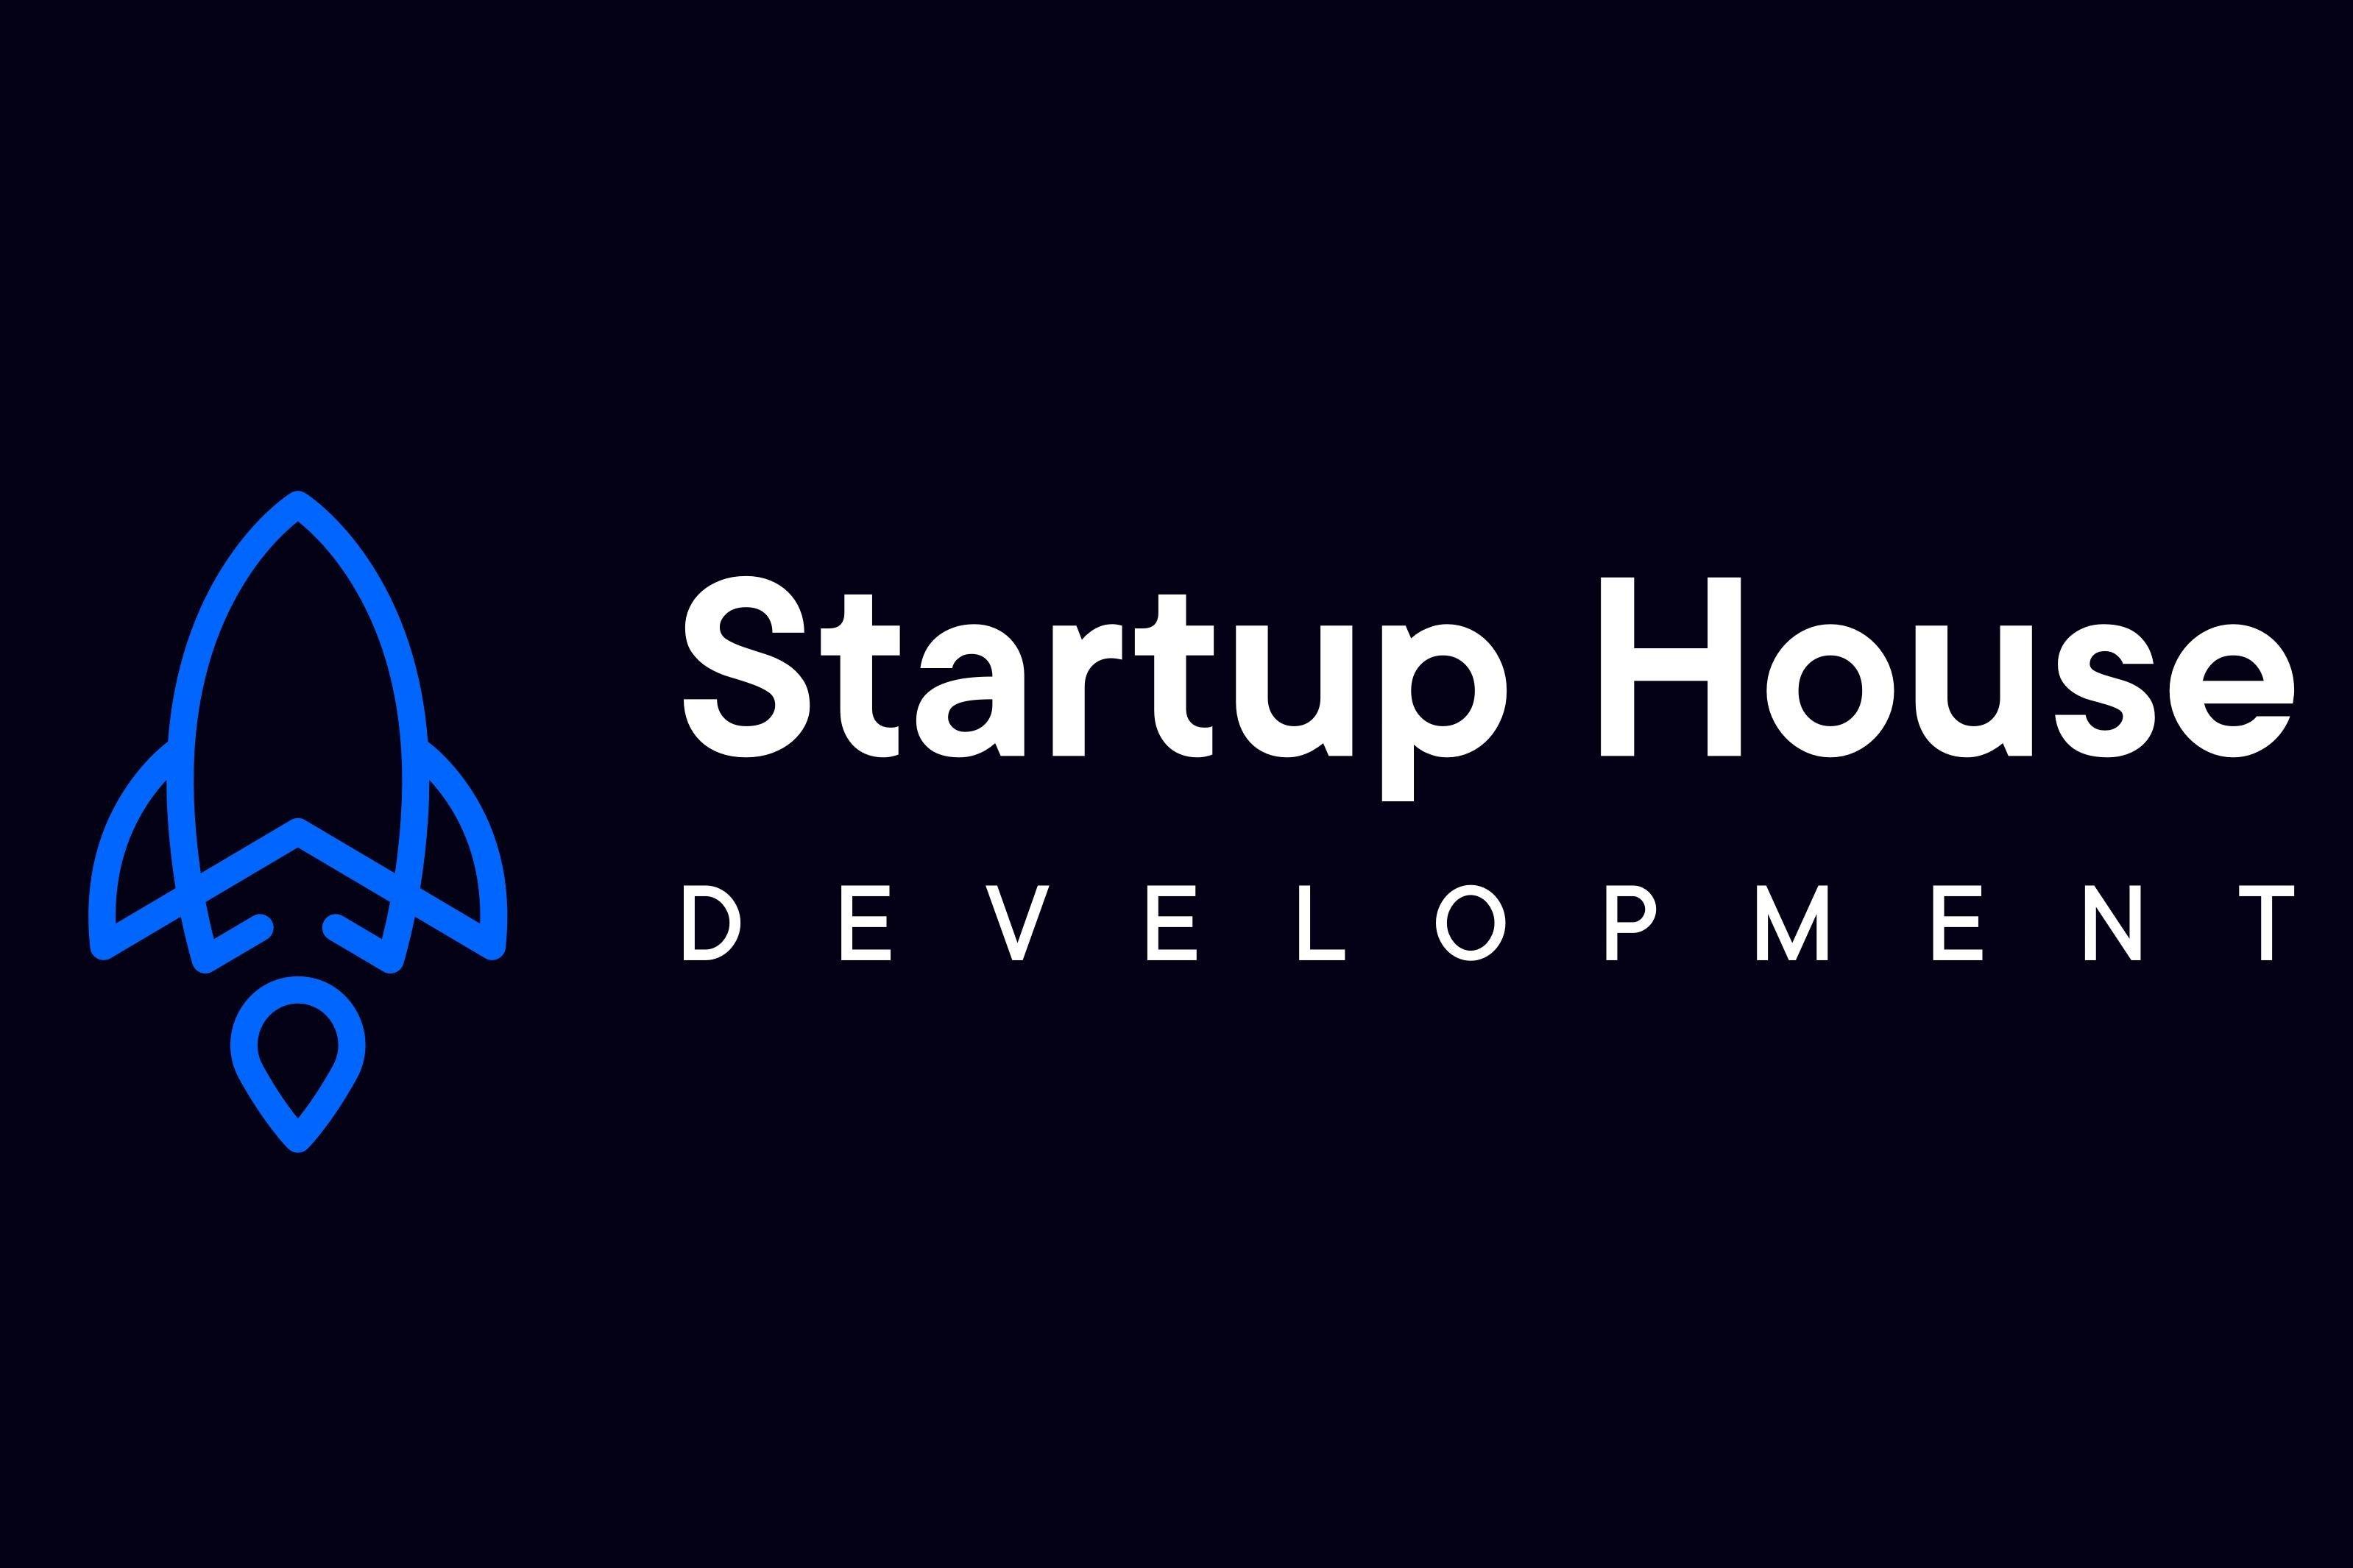 Startup Development House